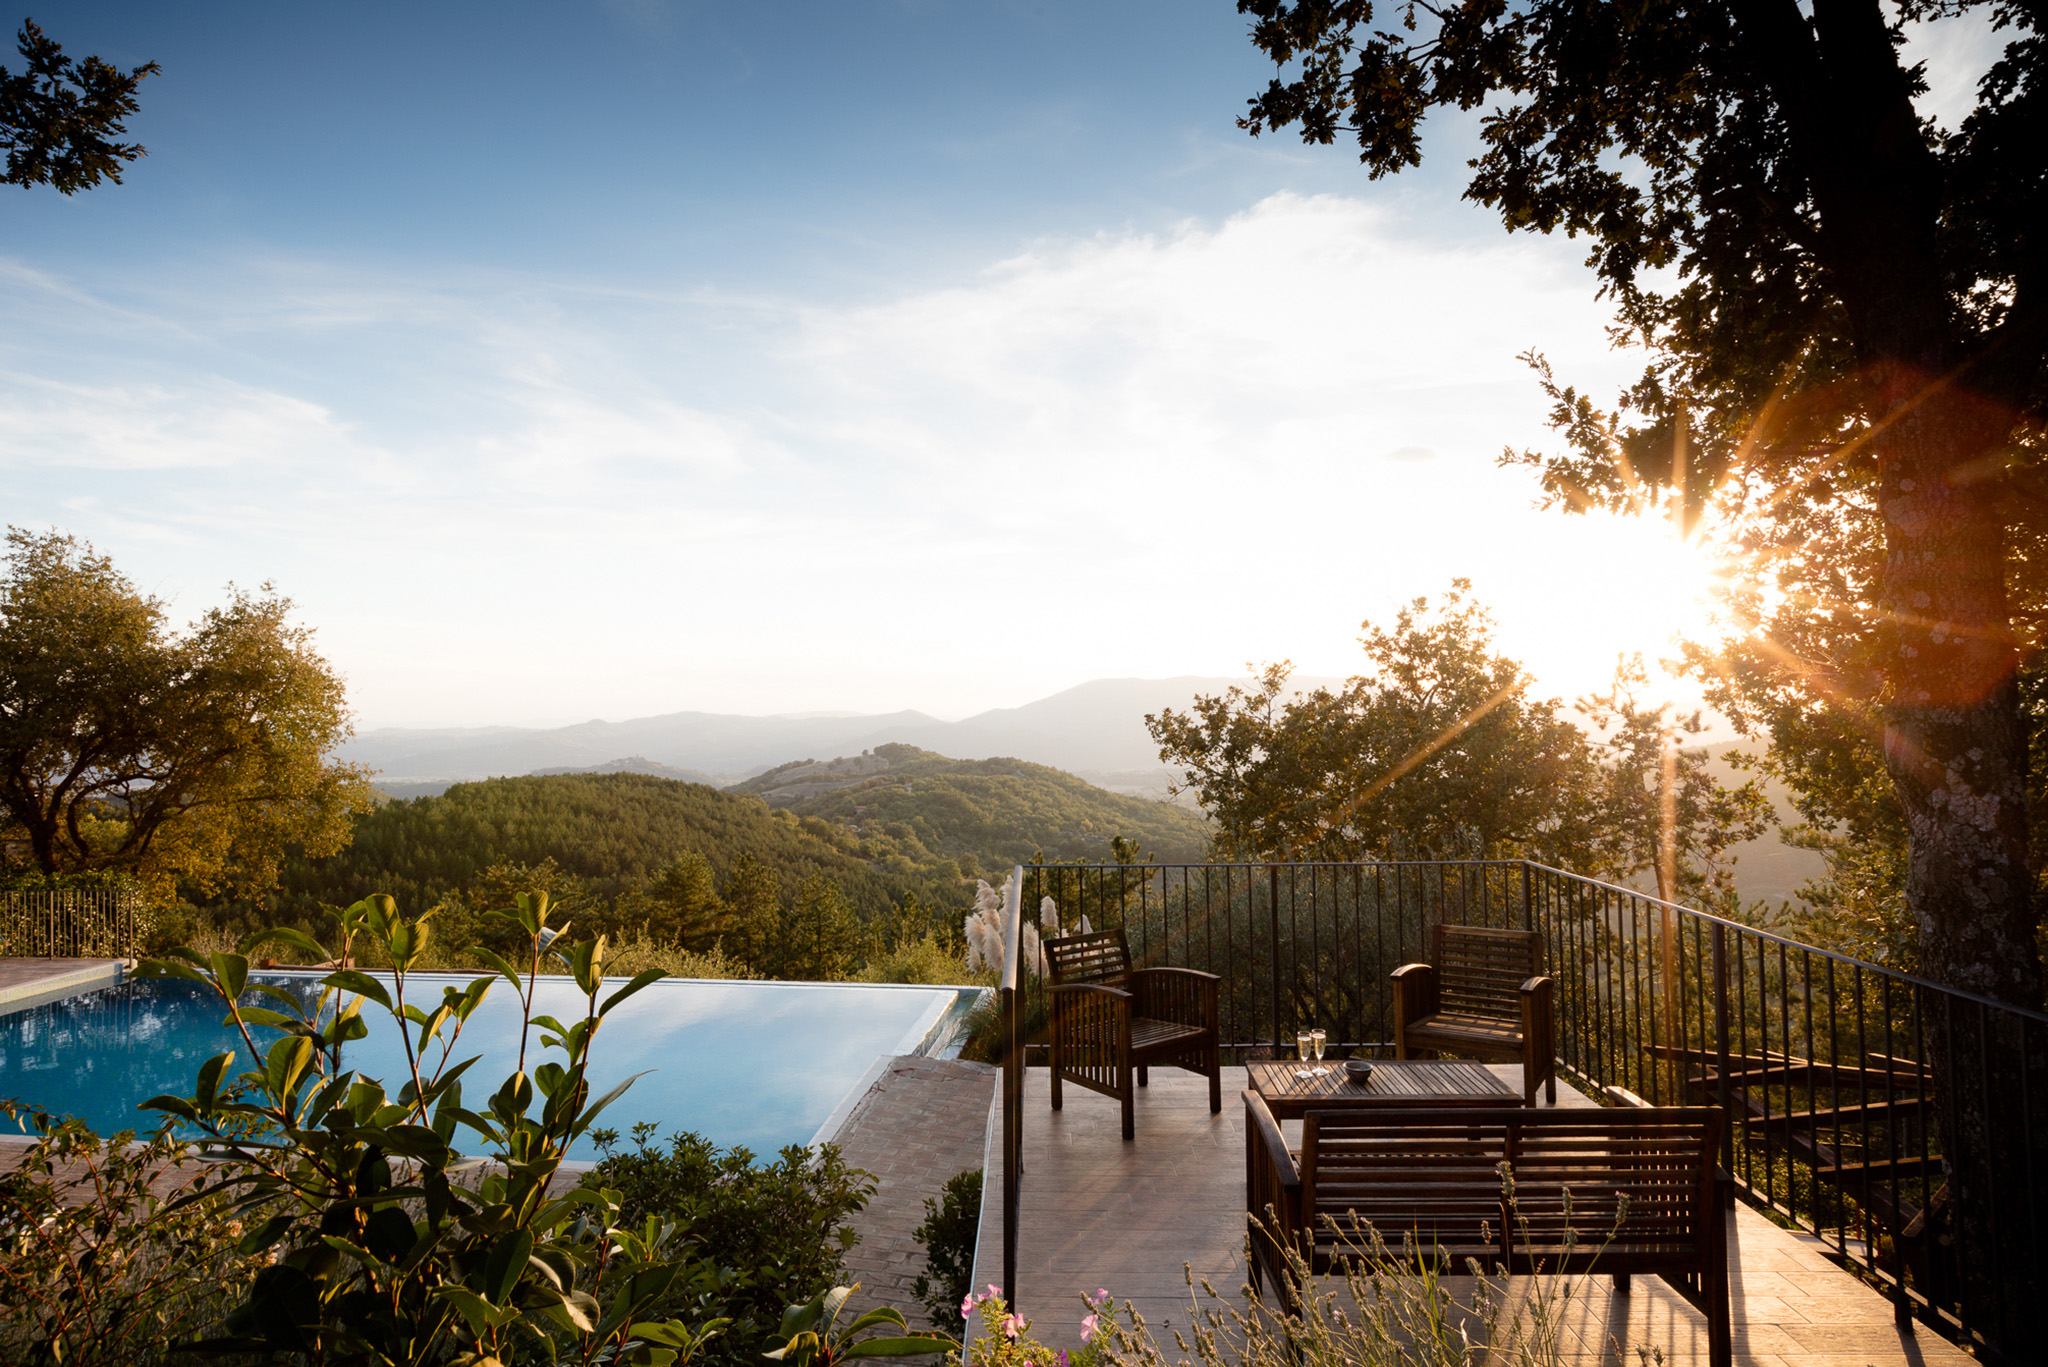 Luxury Vacation Property Photography - Jon Kempner Photography